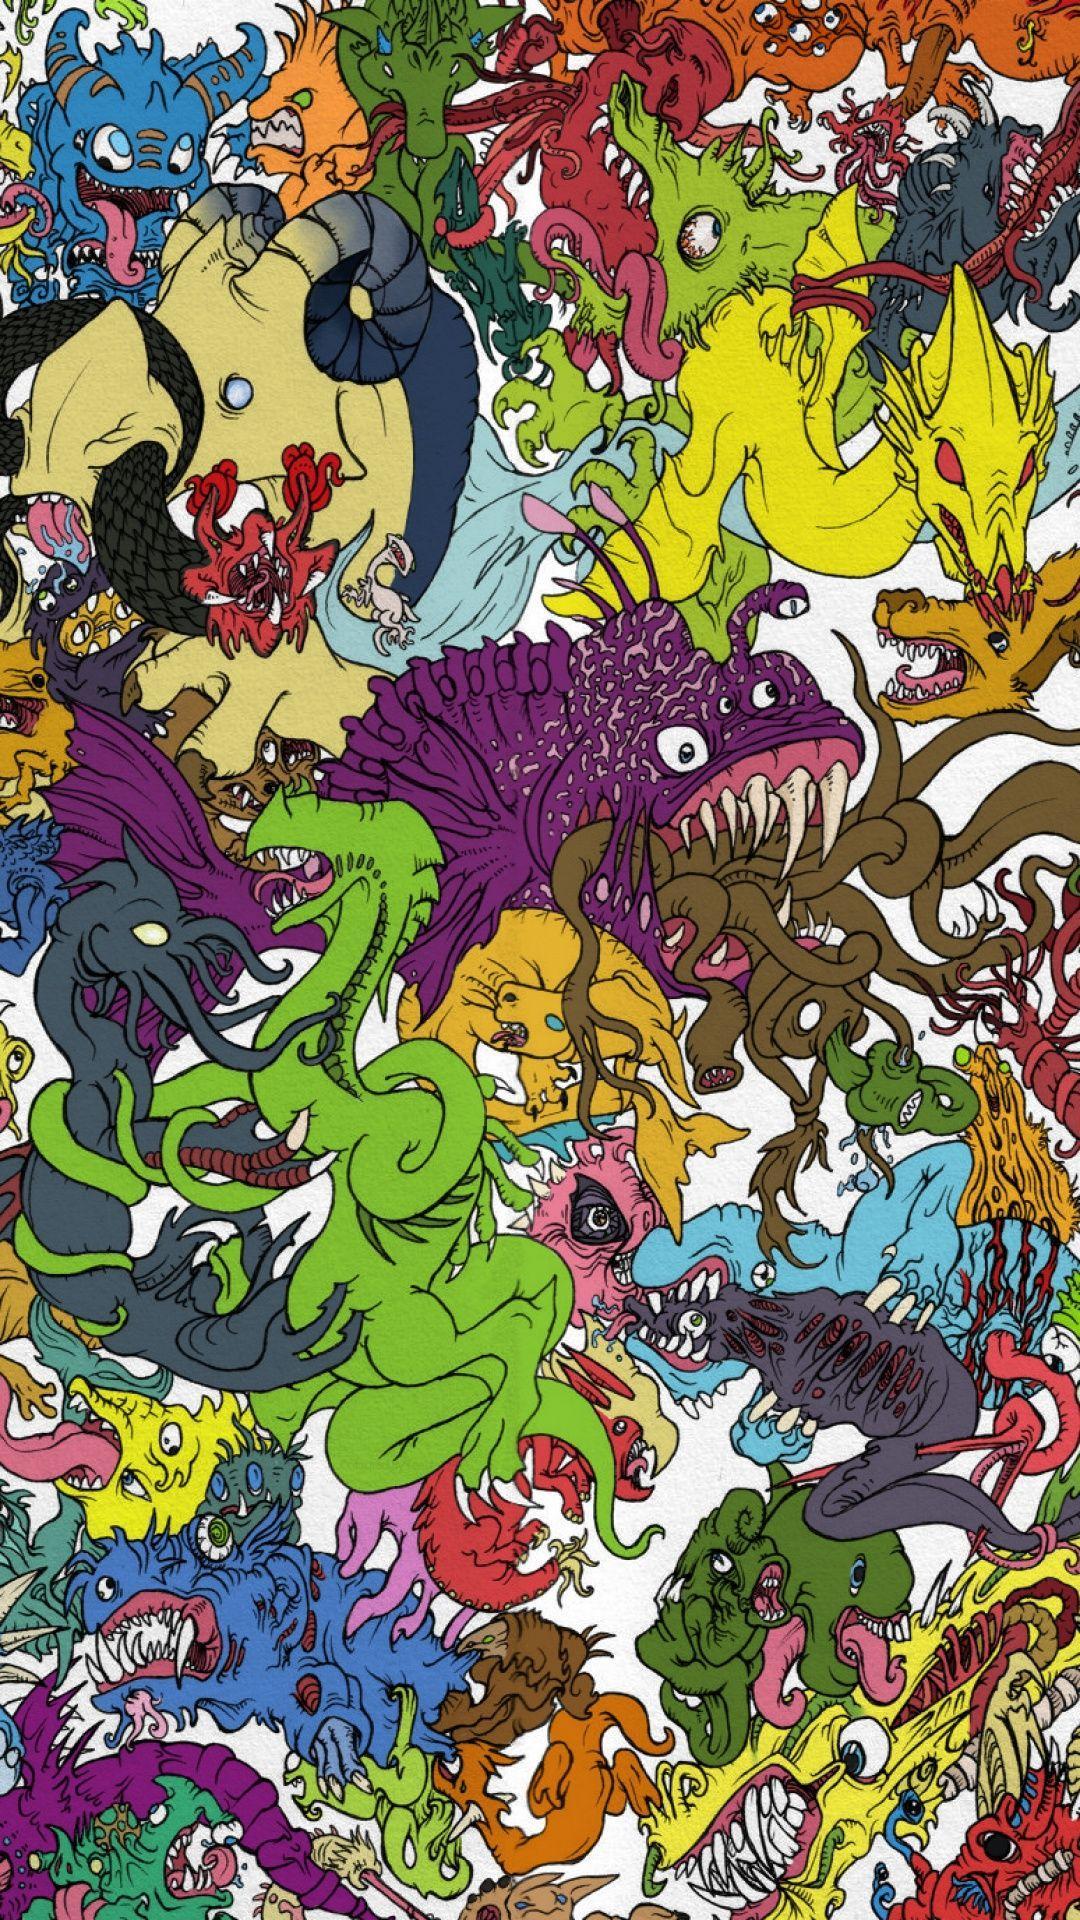 Trippy Cartoon Wallpapers - Top Free Trippy Cartoon ...